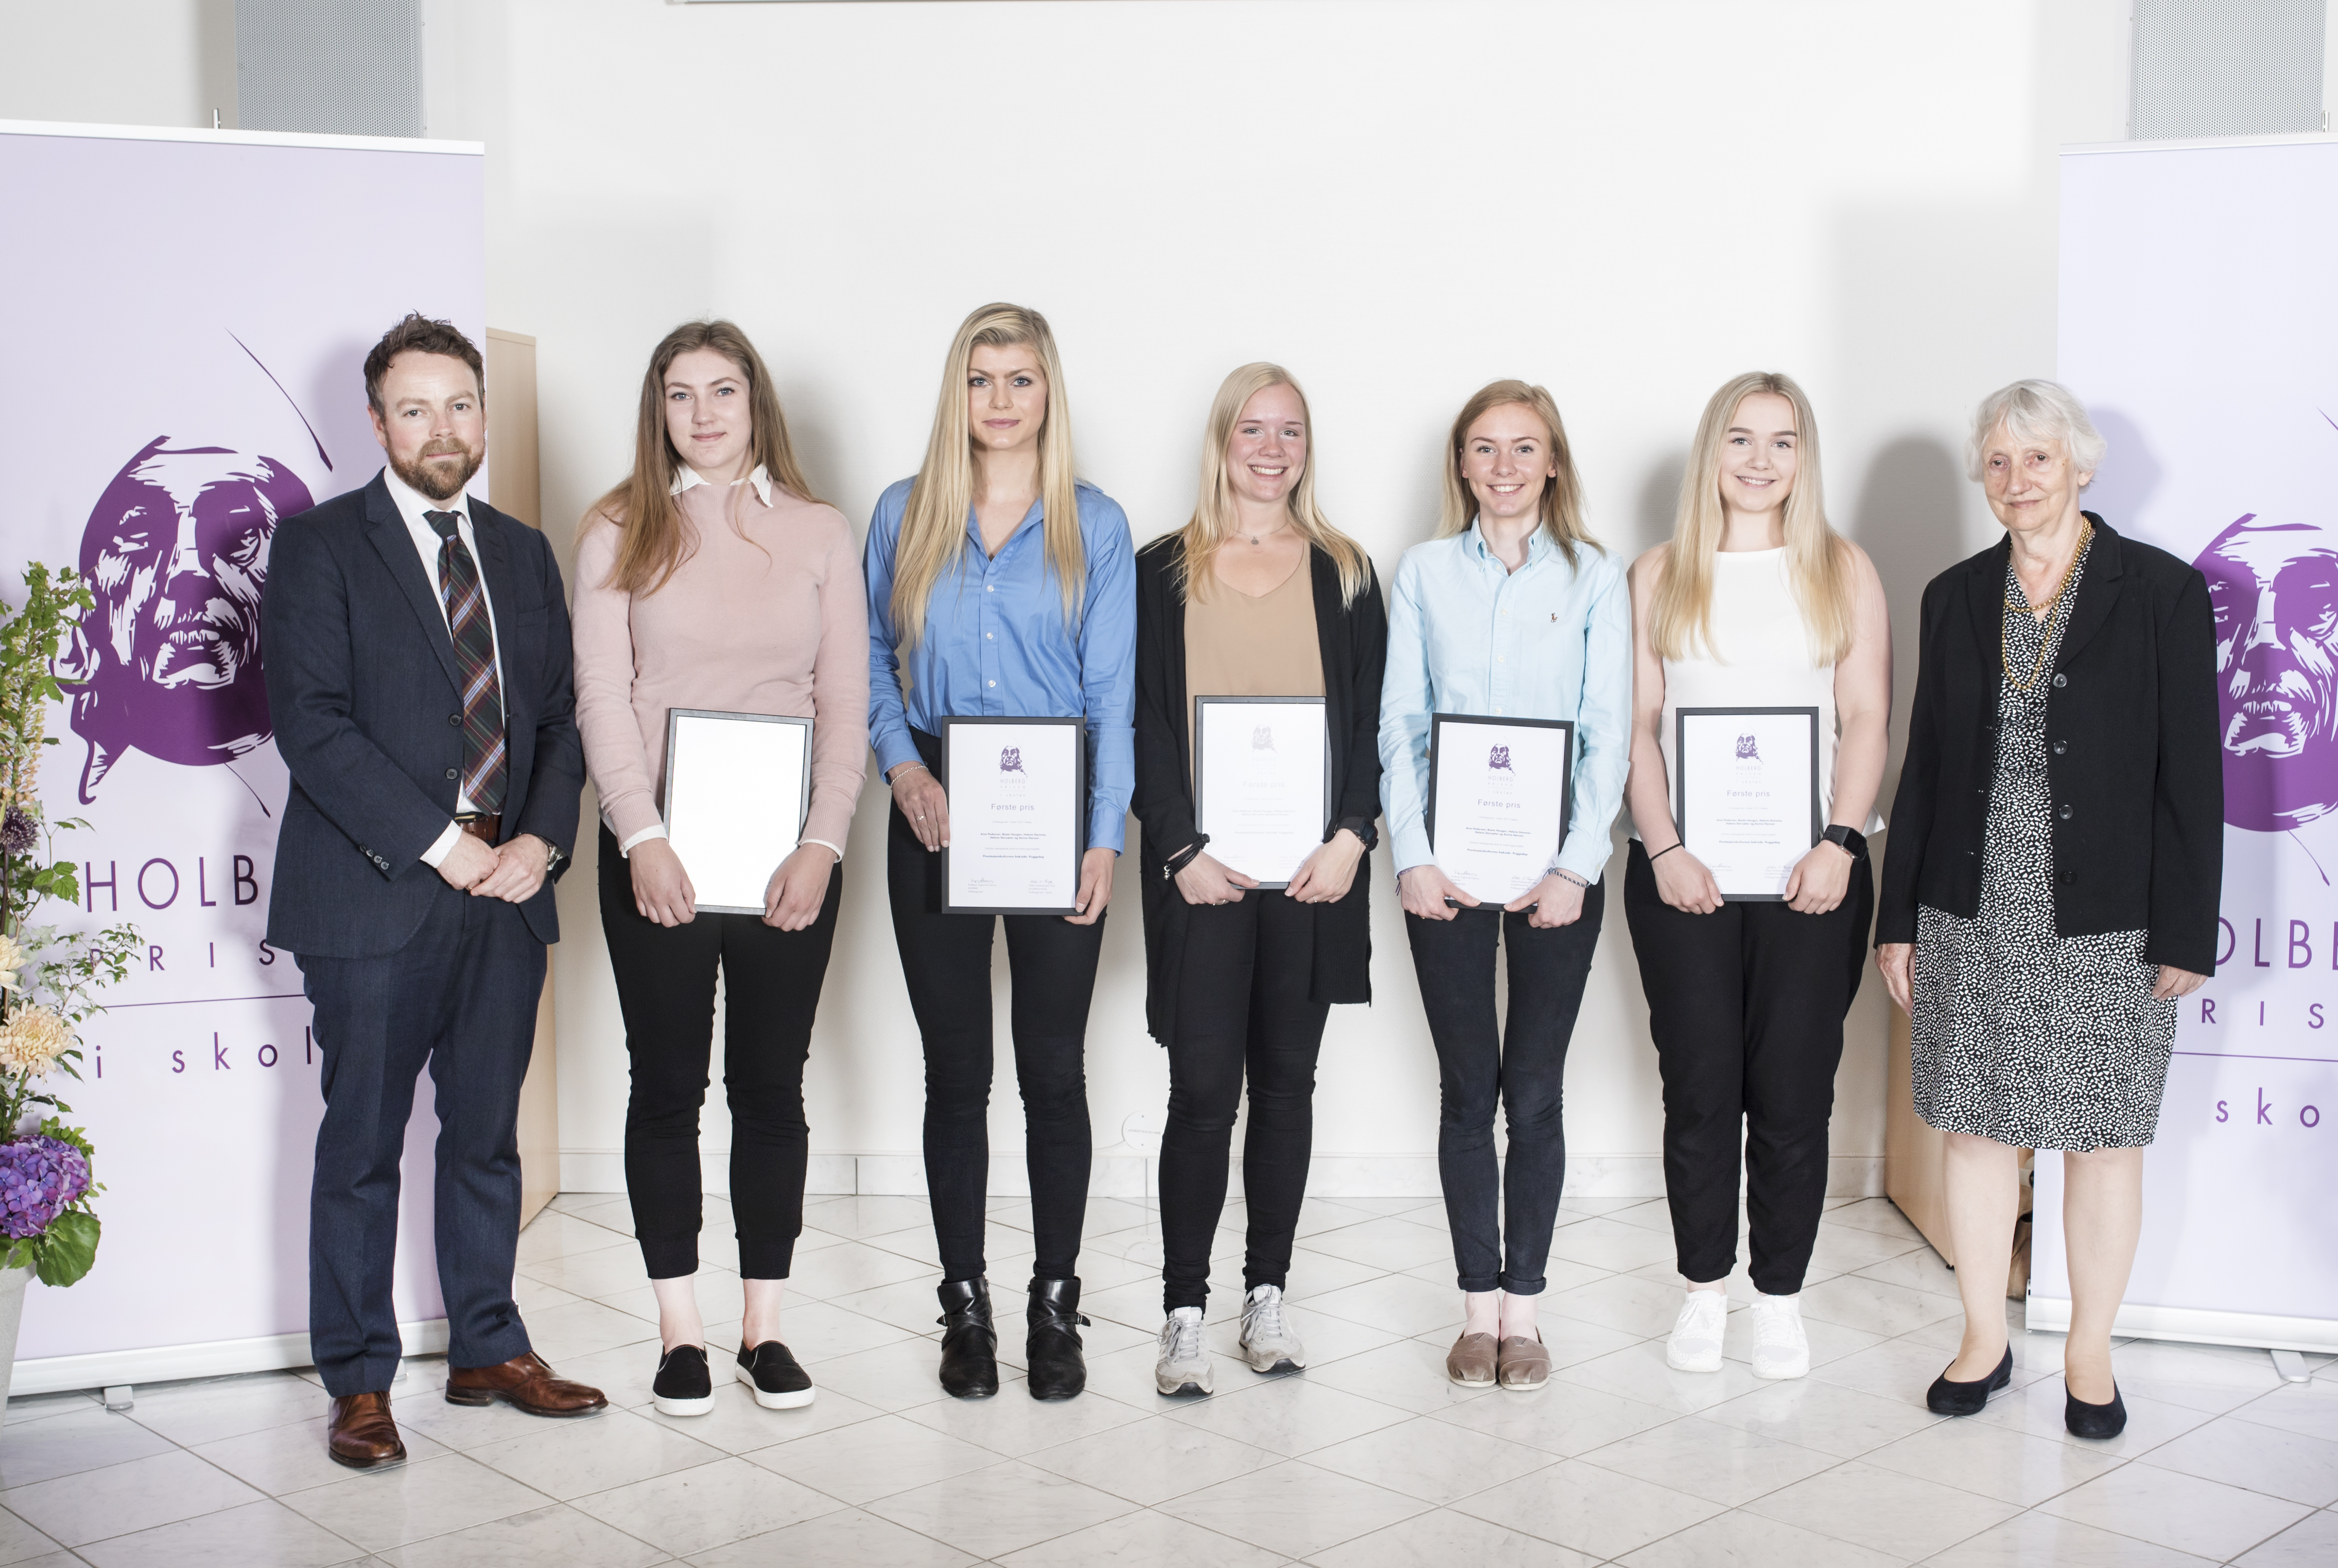 Skoleprisvinnerne 2017 Aina Pedersen, Beate Haugen, Helene Storenes, Helene Storsæter, Serina Hansen